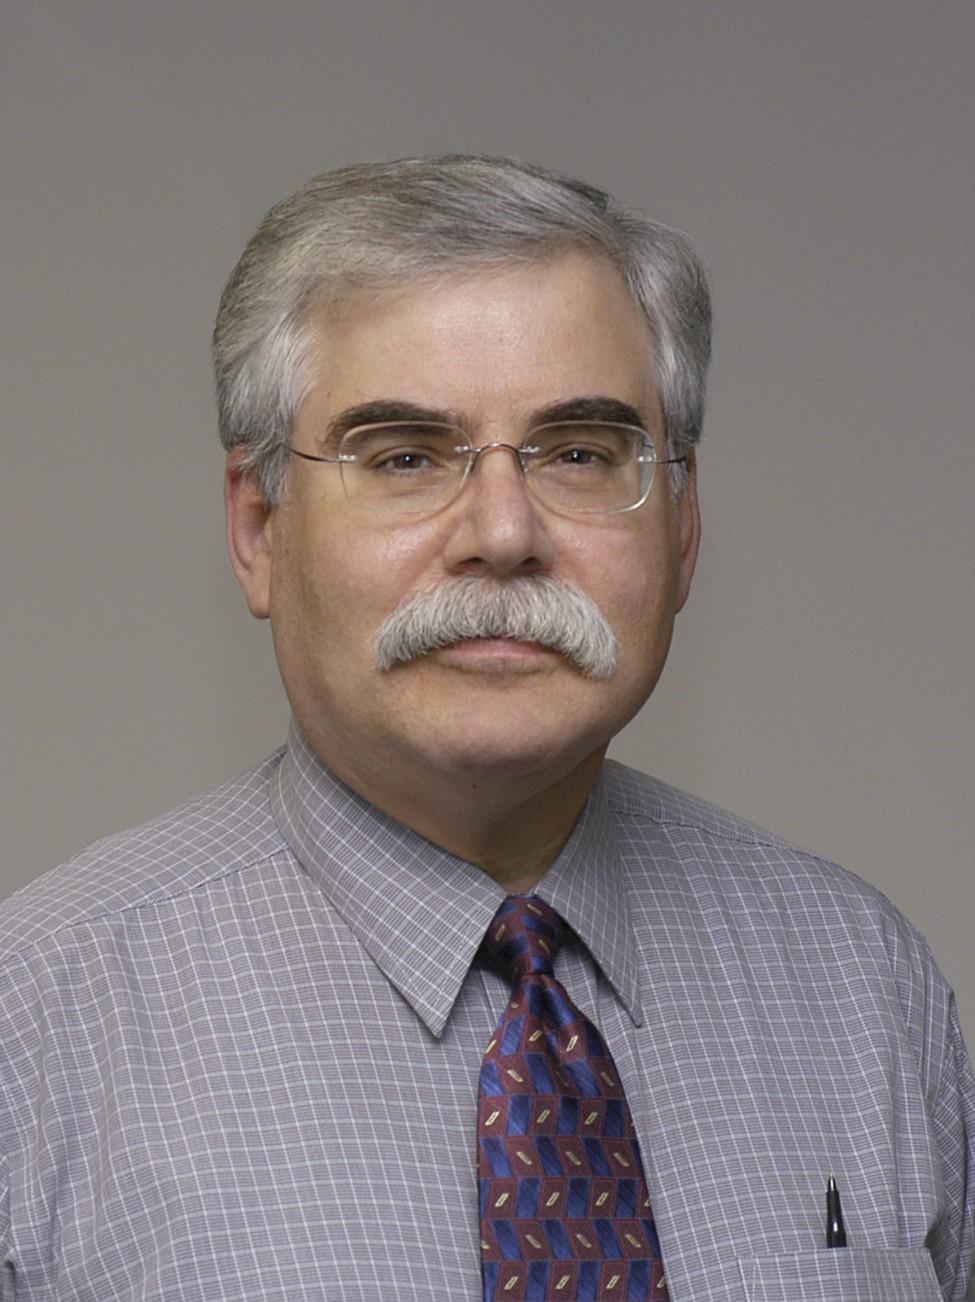 Jeffrey Sklar